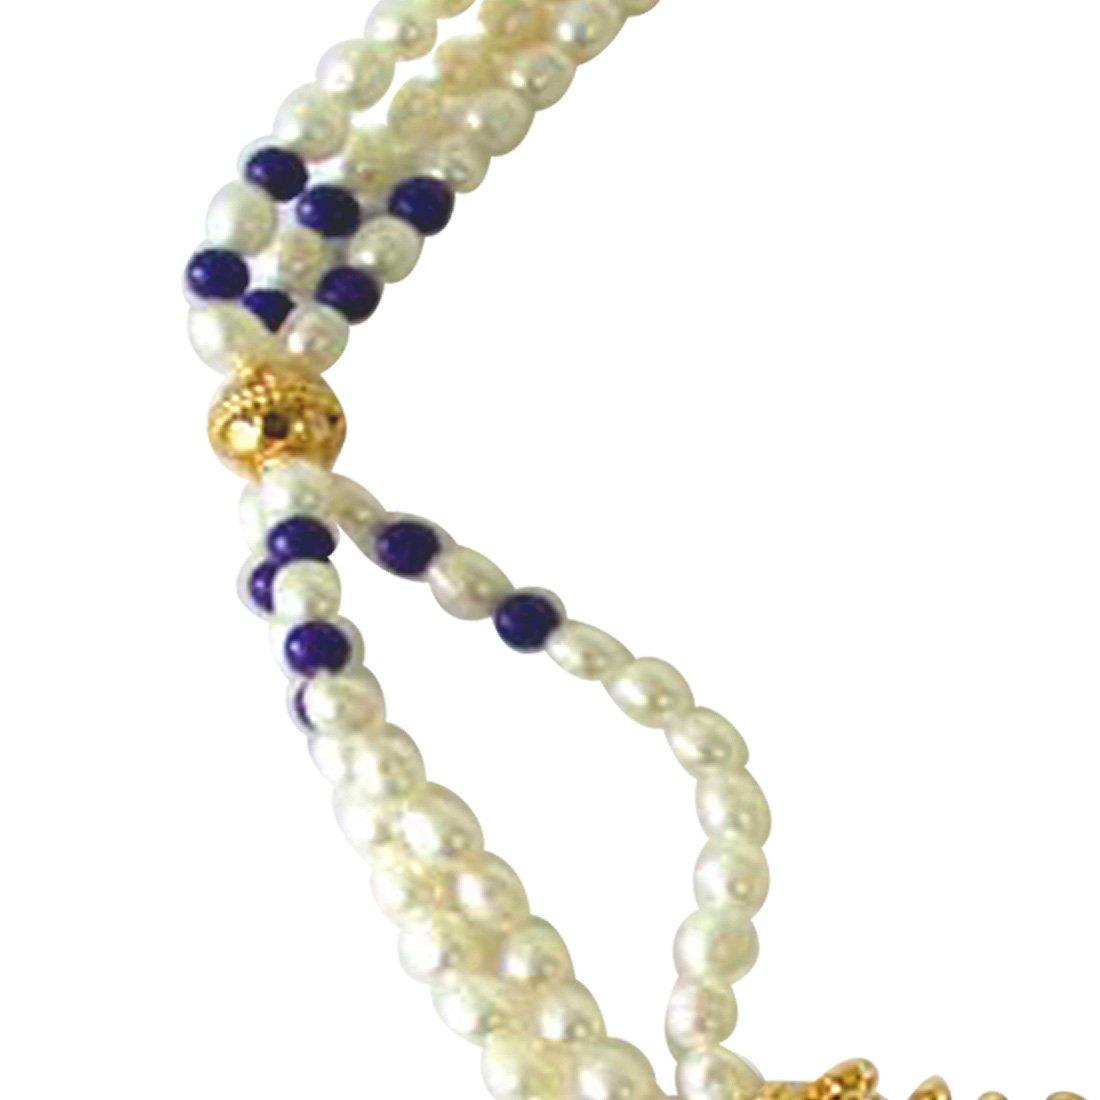 Gold Plated Temple Design Pendant, 3 Line Rice Pearl & Blue Lapiz Beads Pendant Necklace for Women (SNP4B)